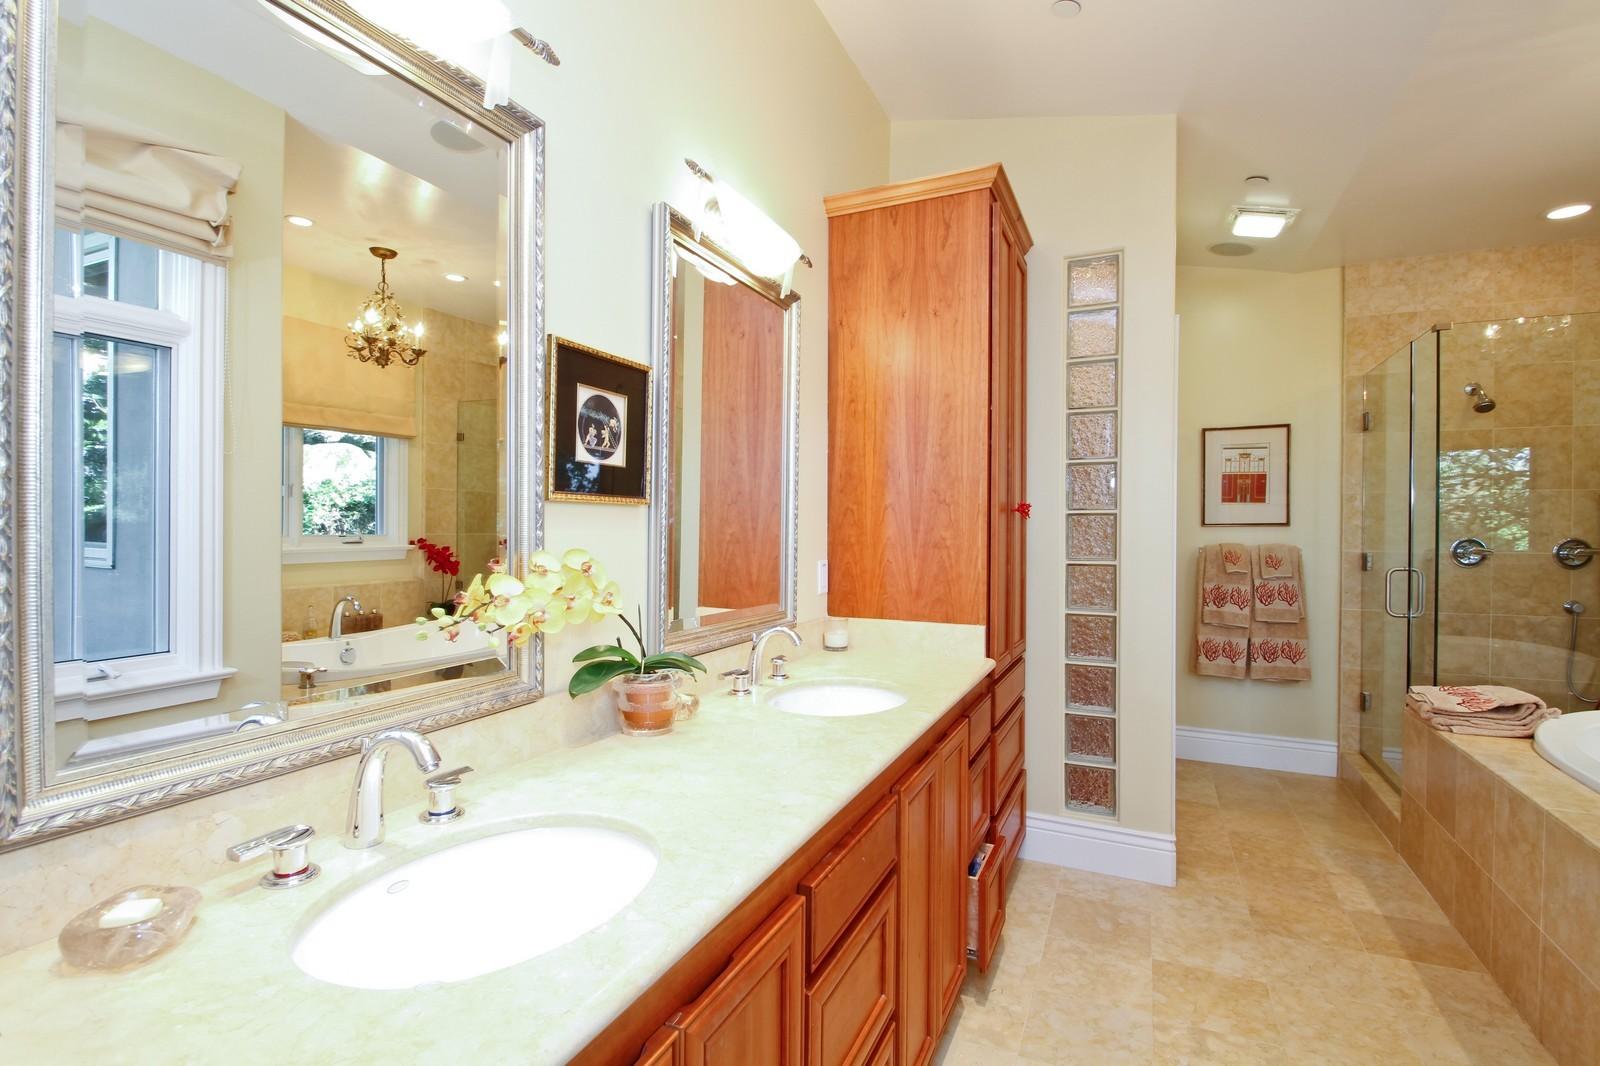 Real Estate Photography - 73 Upper Toyon Drive, Kentfield, CA, 94904 - Master Bathroom